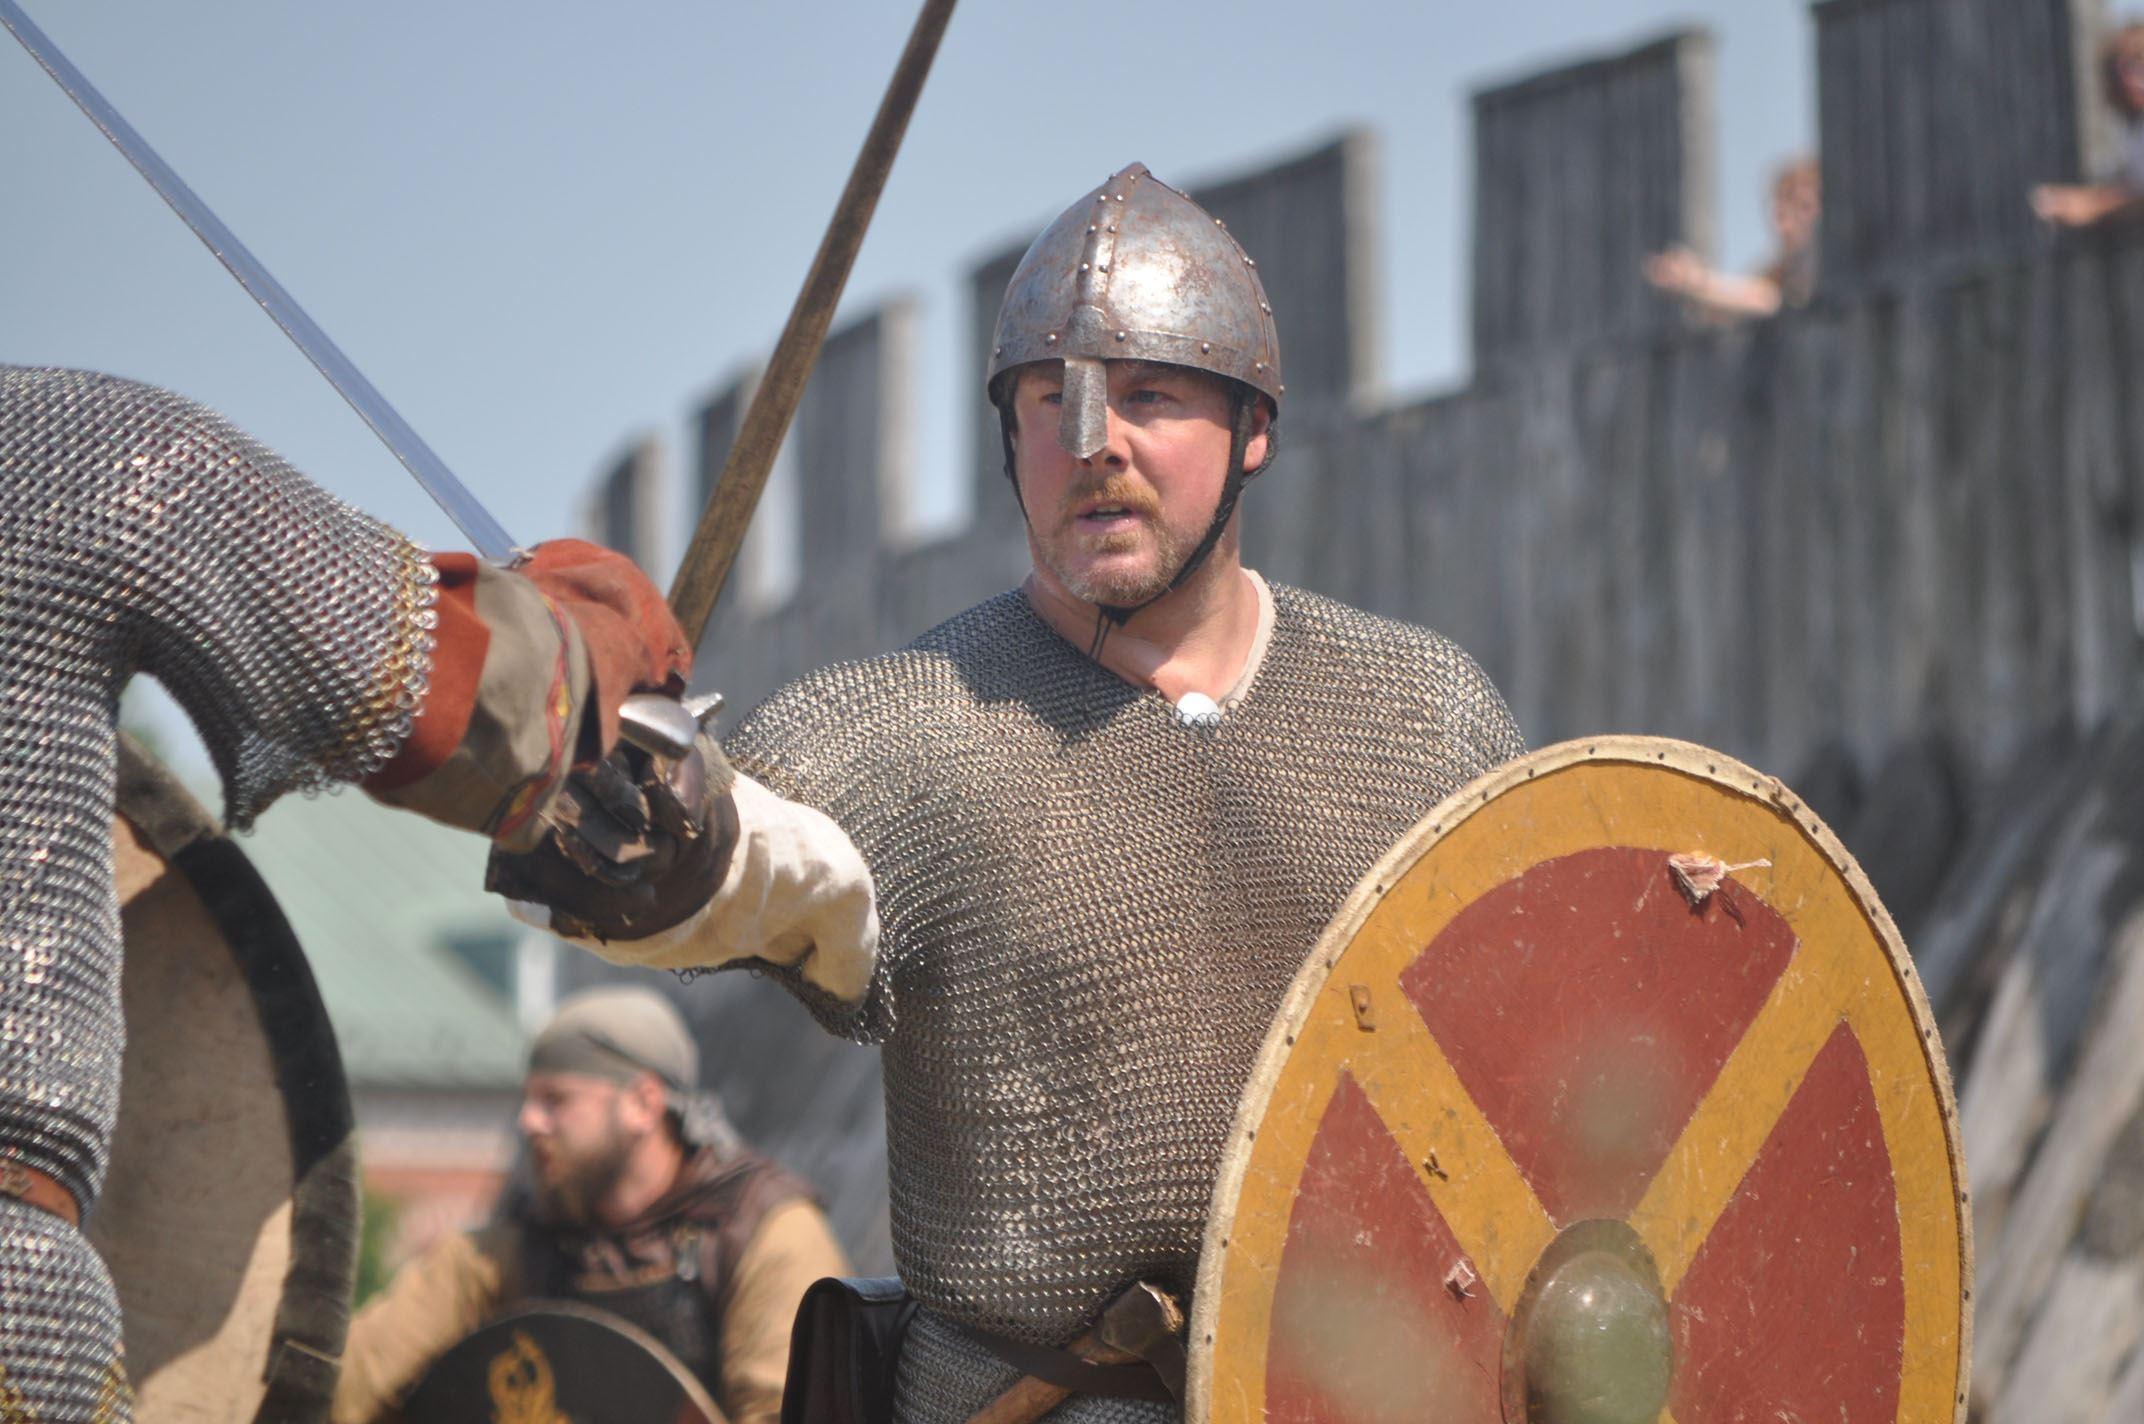 The battle of Trelleborgen